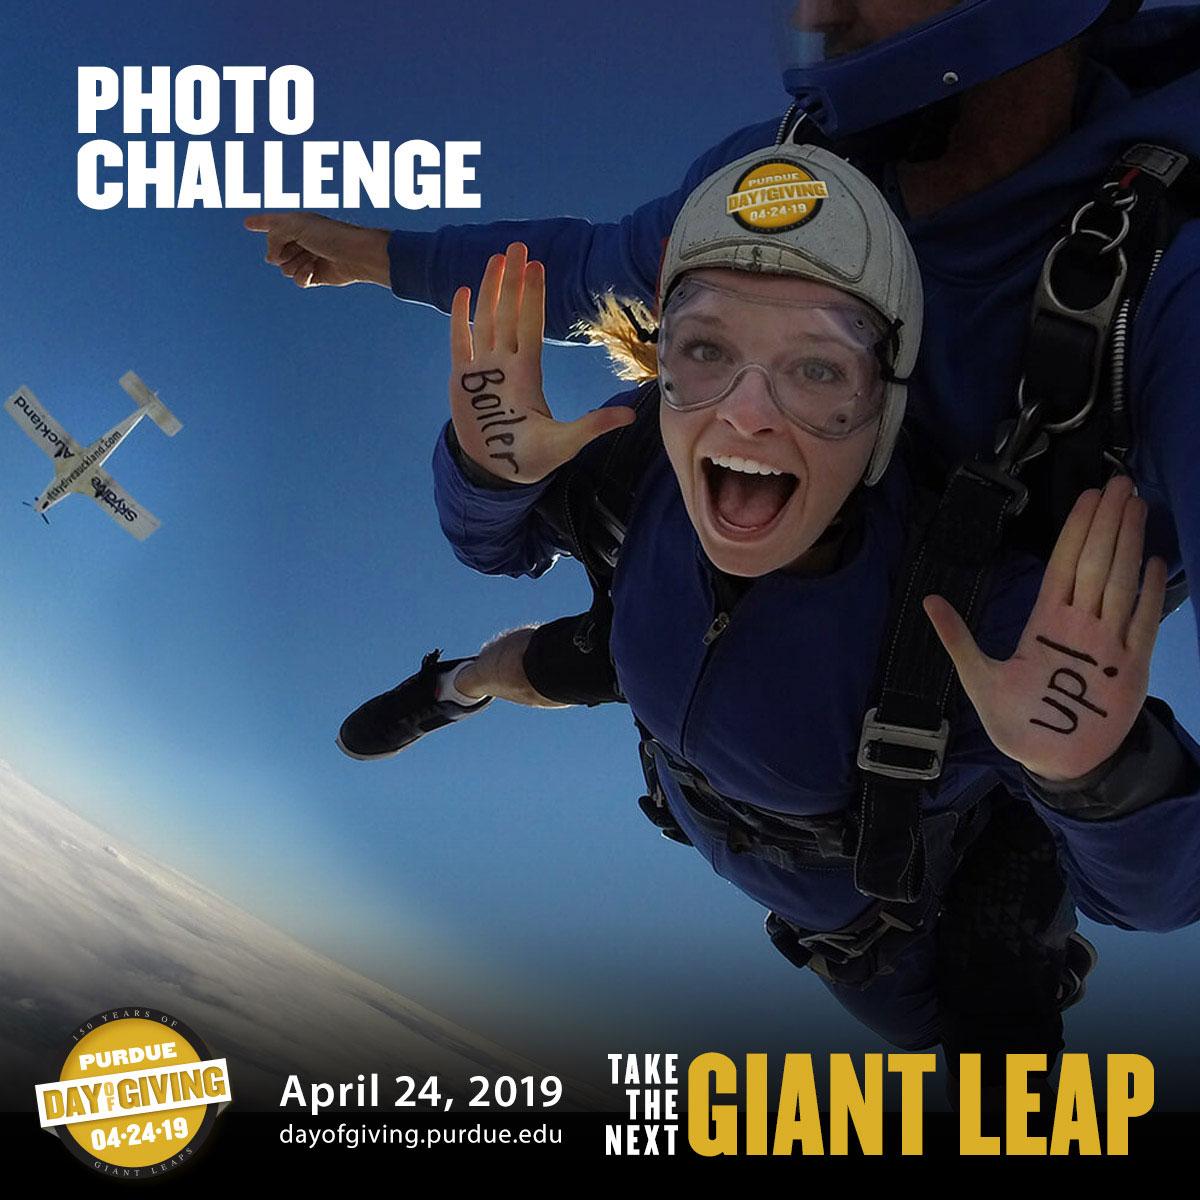 challenges_19.jpg